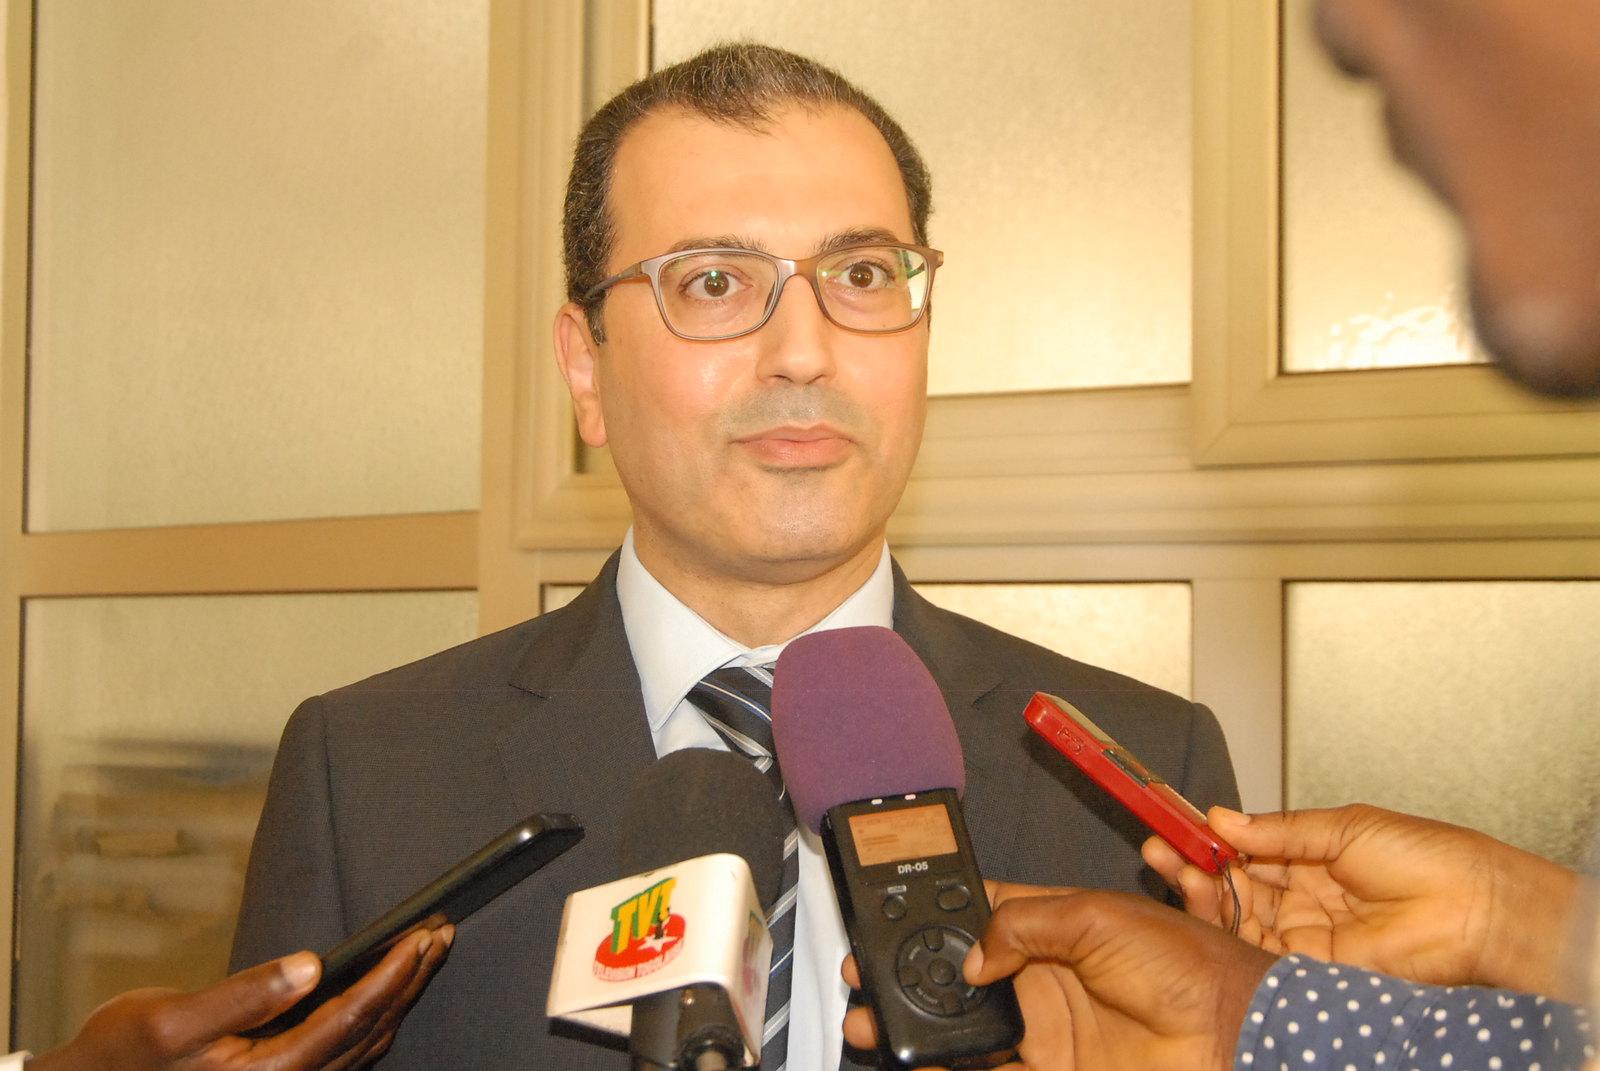 ambassadeur d'Egypte près le Togo